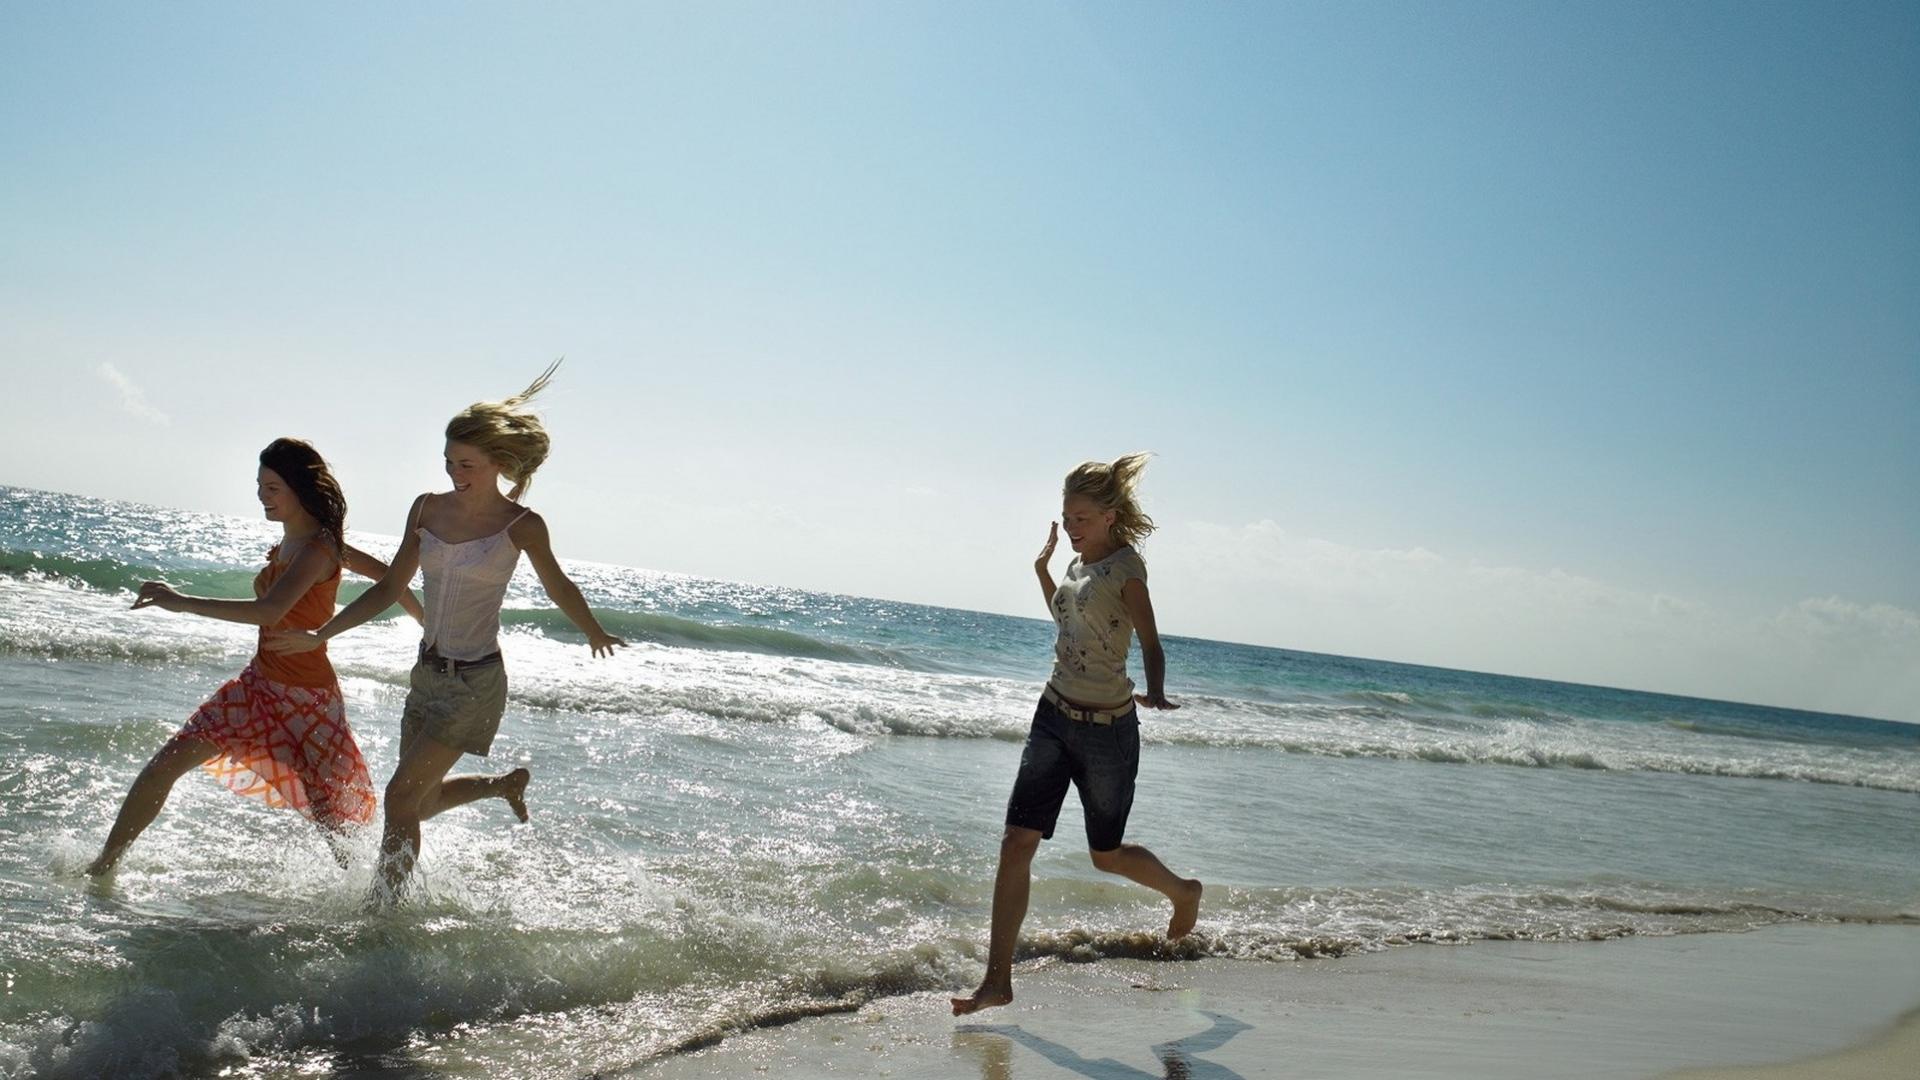 Download Wallpaper 1920x1080 Girls Beach Sea Running Sand Full